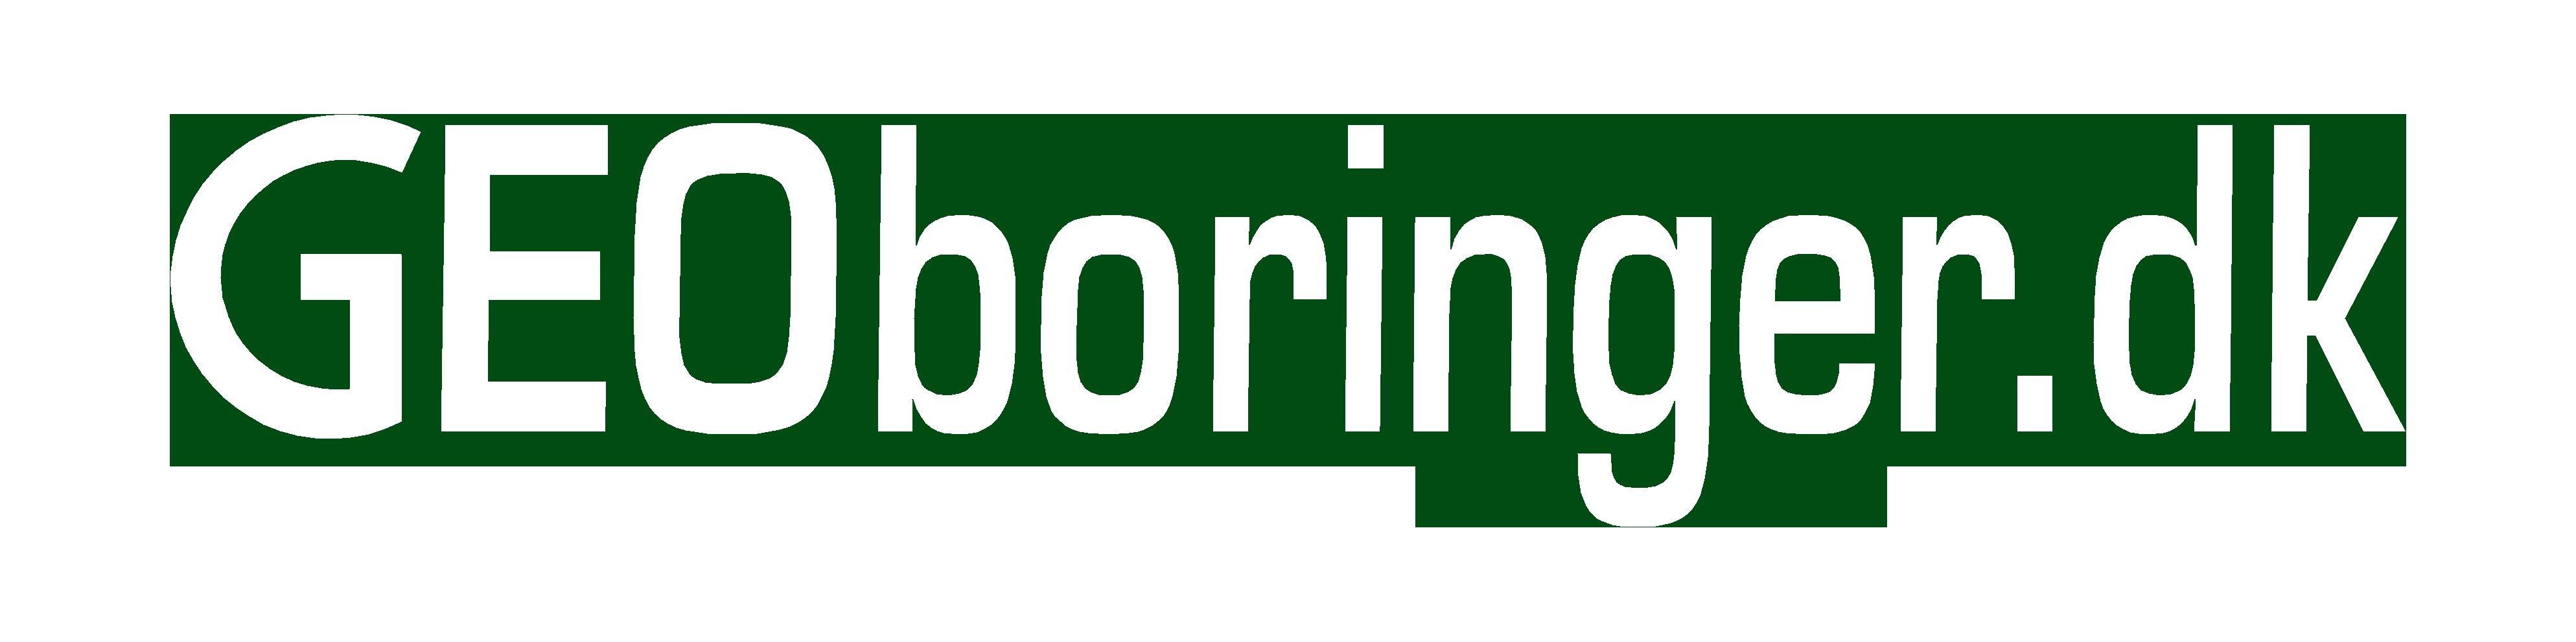 Geoboringer logo